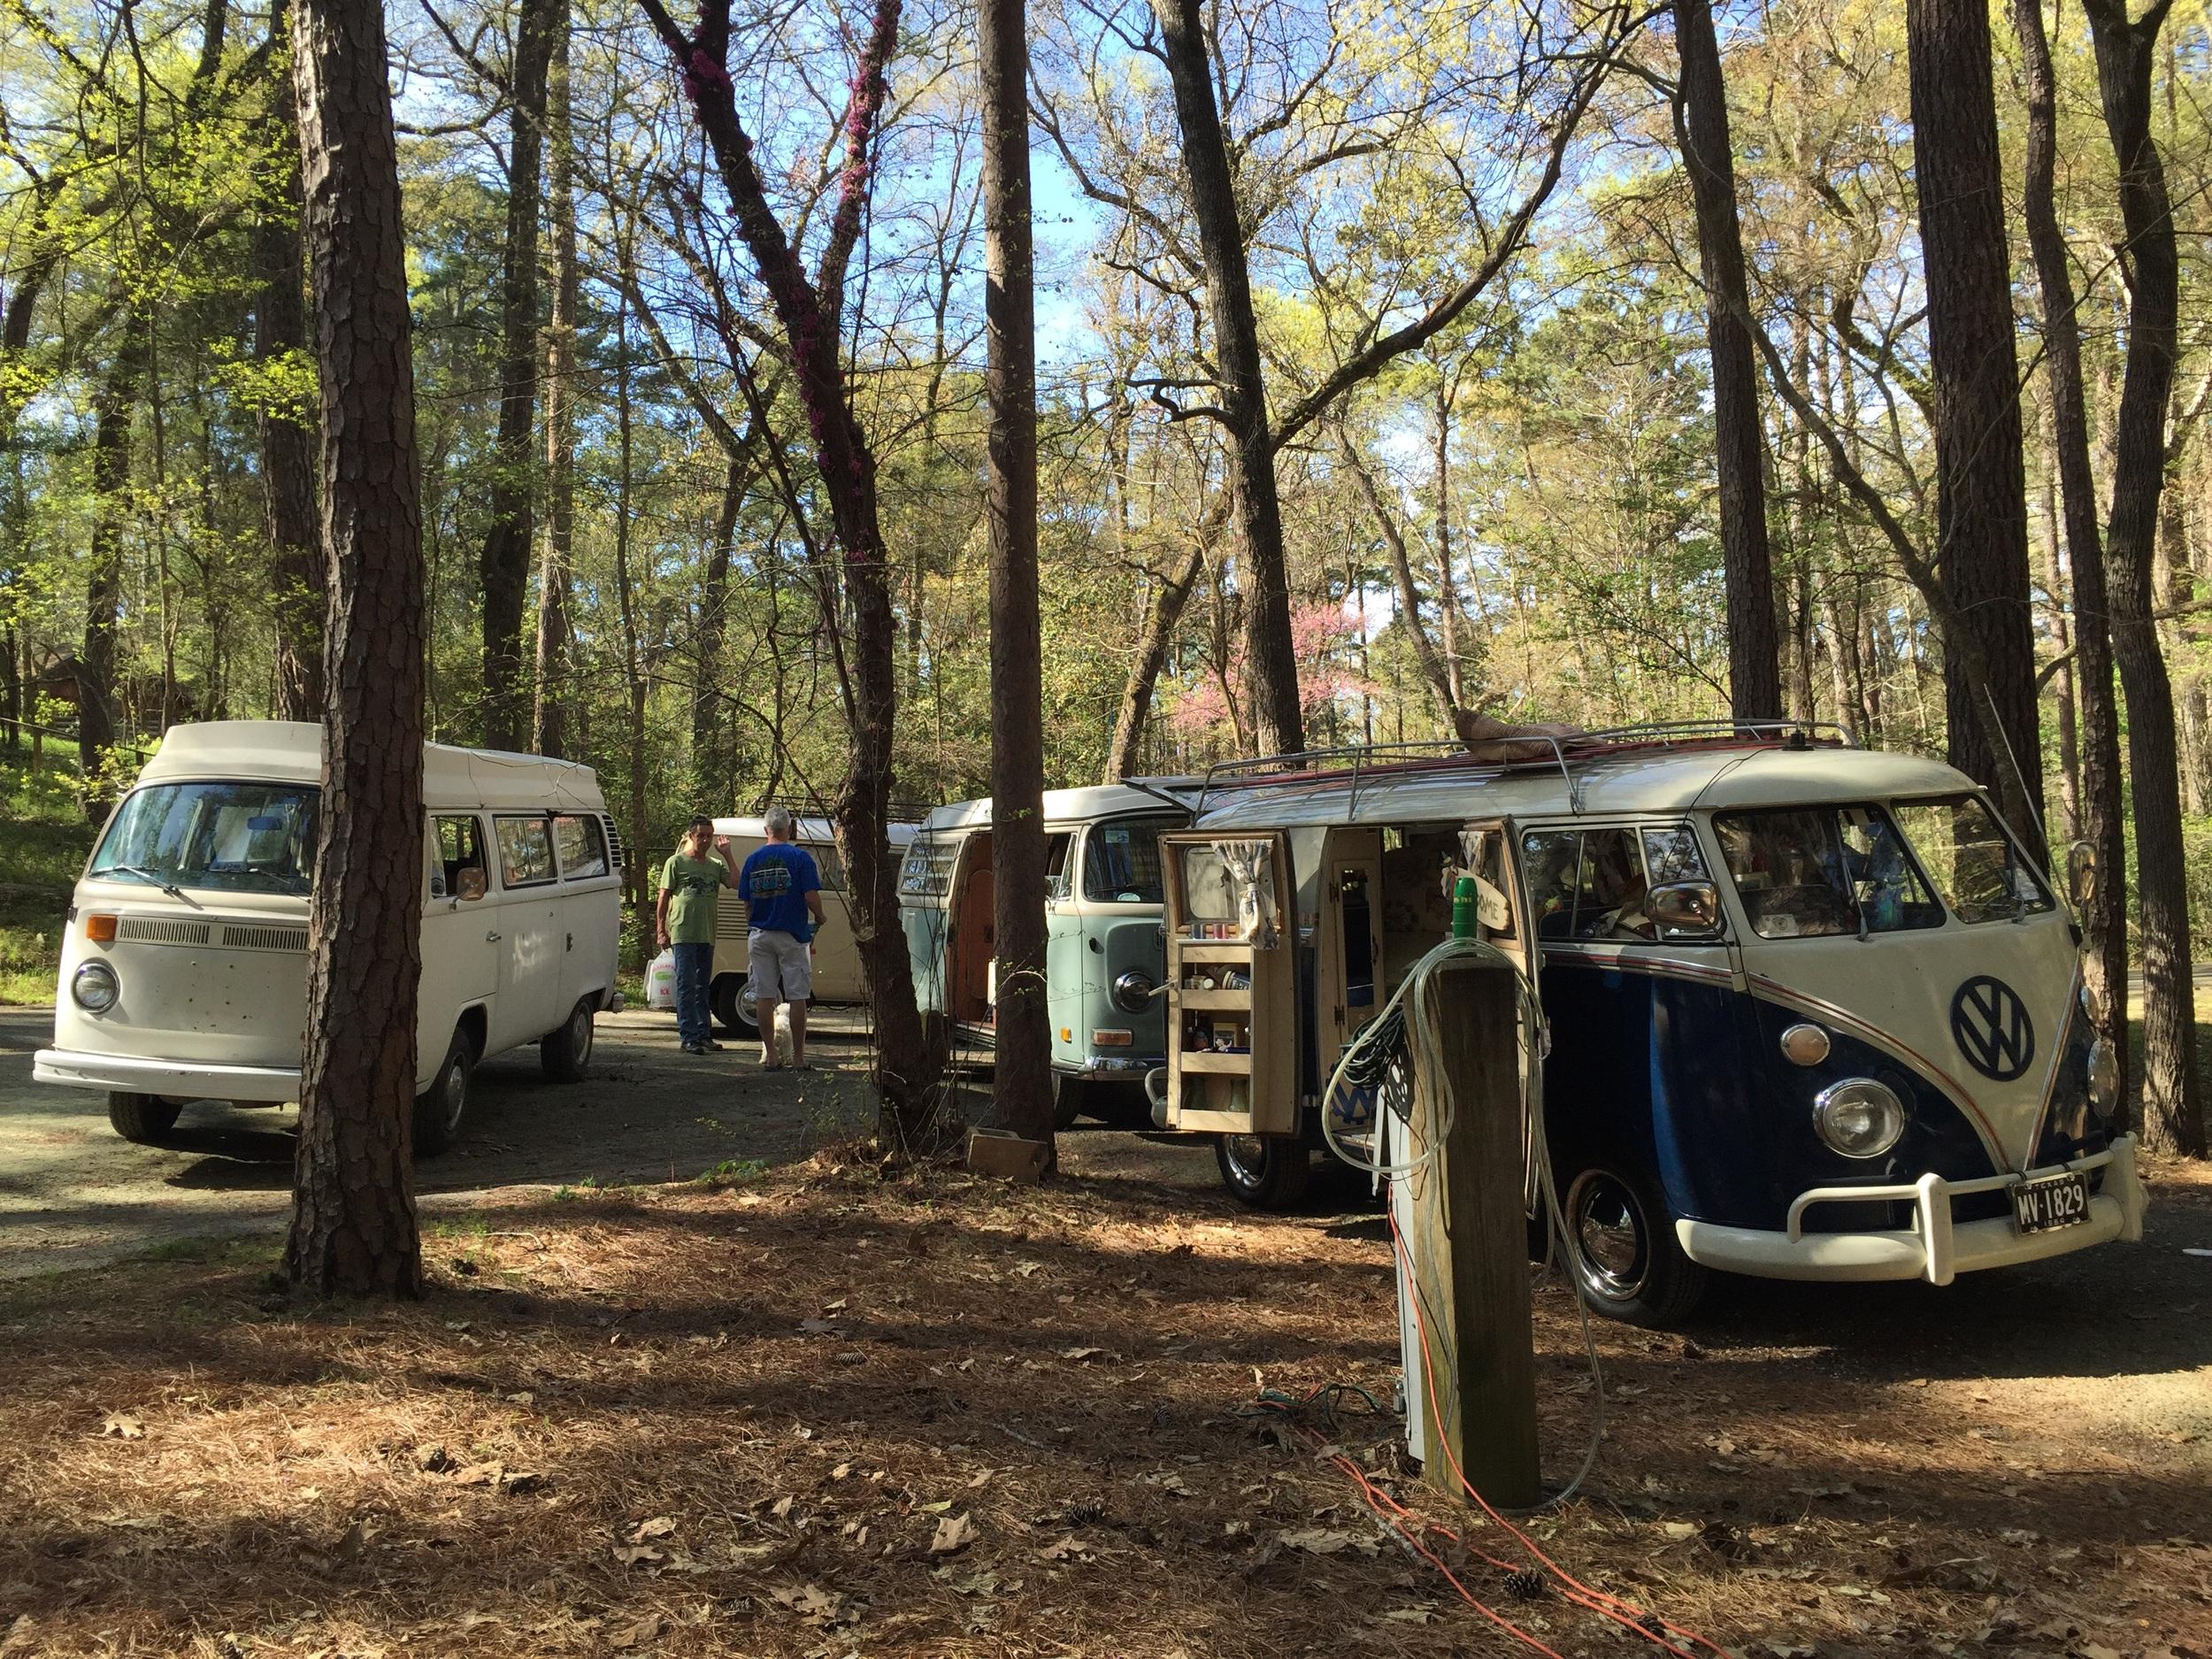 Scott & Julie's 64 Sundial, Kate's 1970 Camper, and Len & Jan's 1978 Riviera